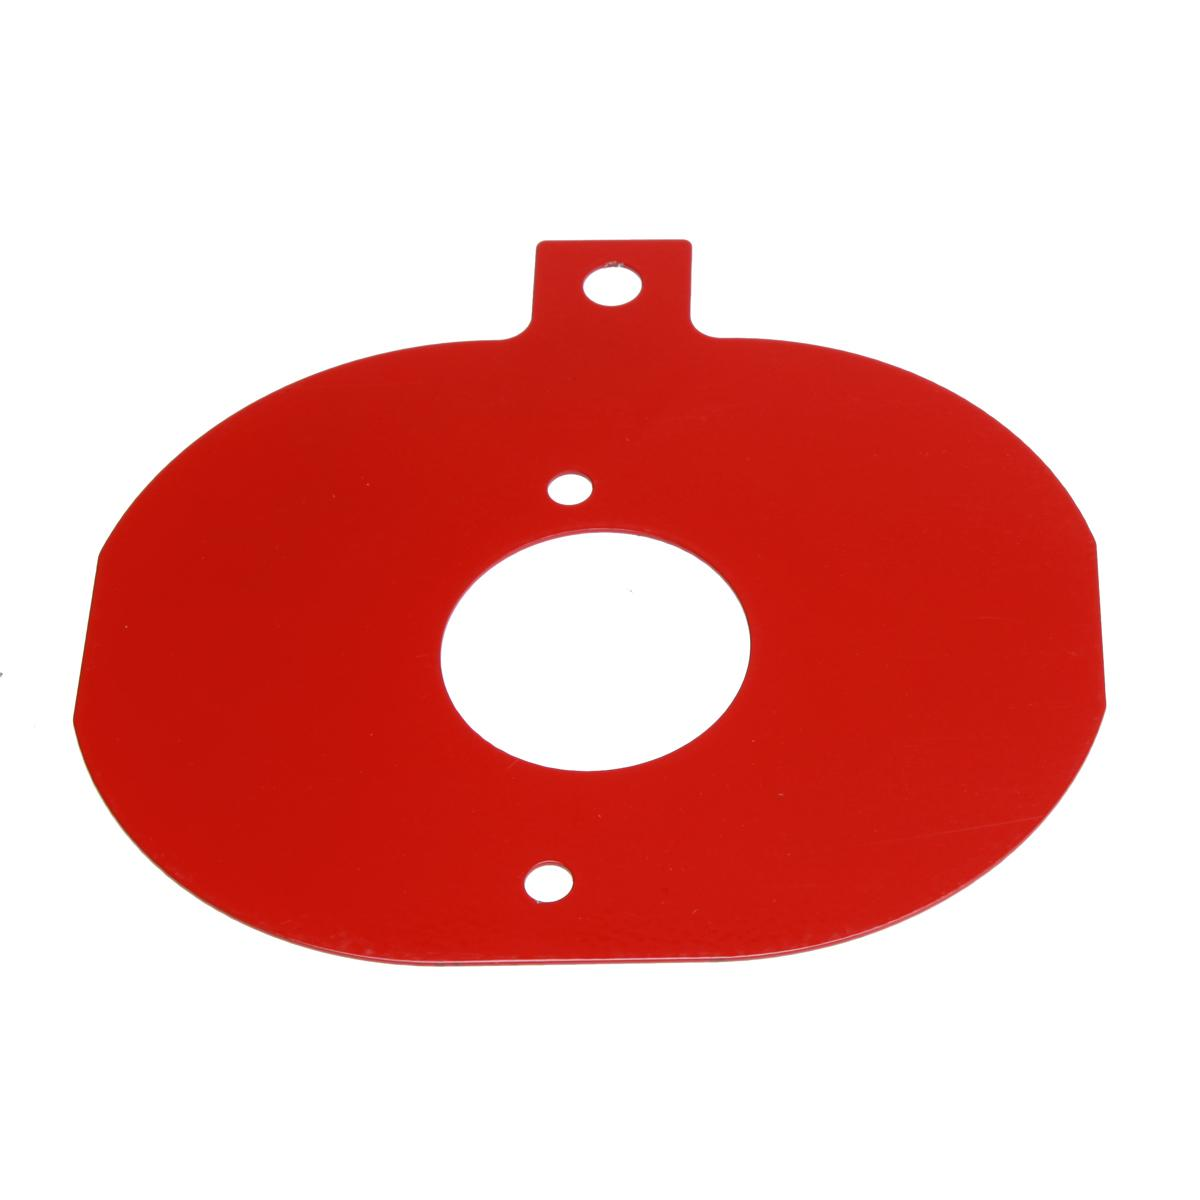 Itg jc20 baseplate 25jc20 from merlin motorsport for Motor base plate design